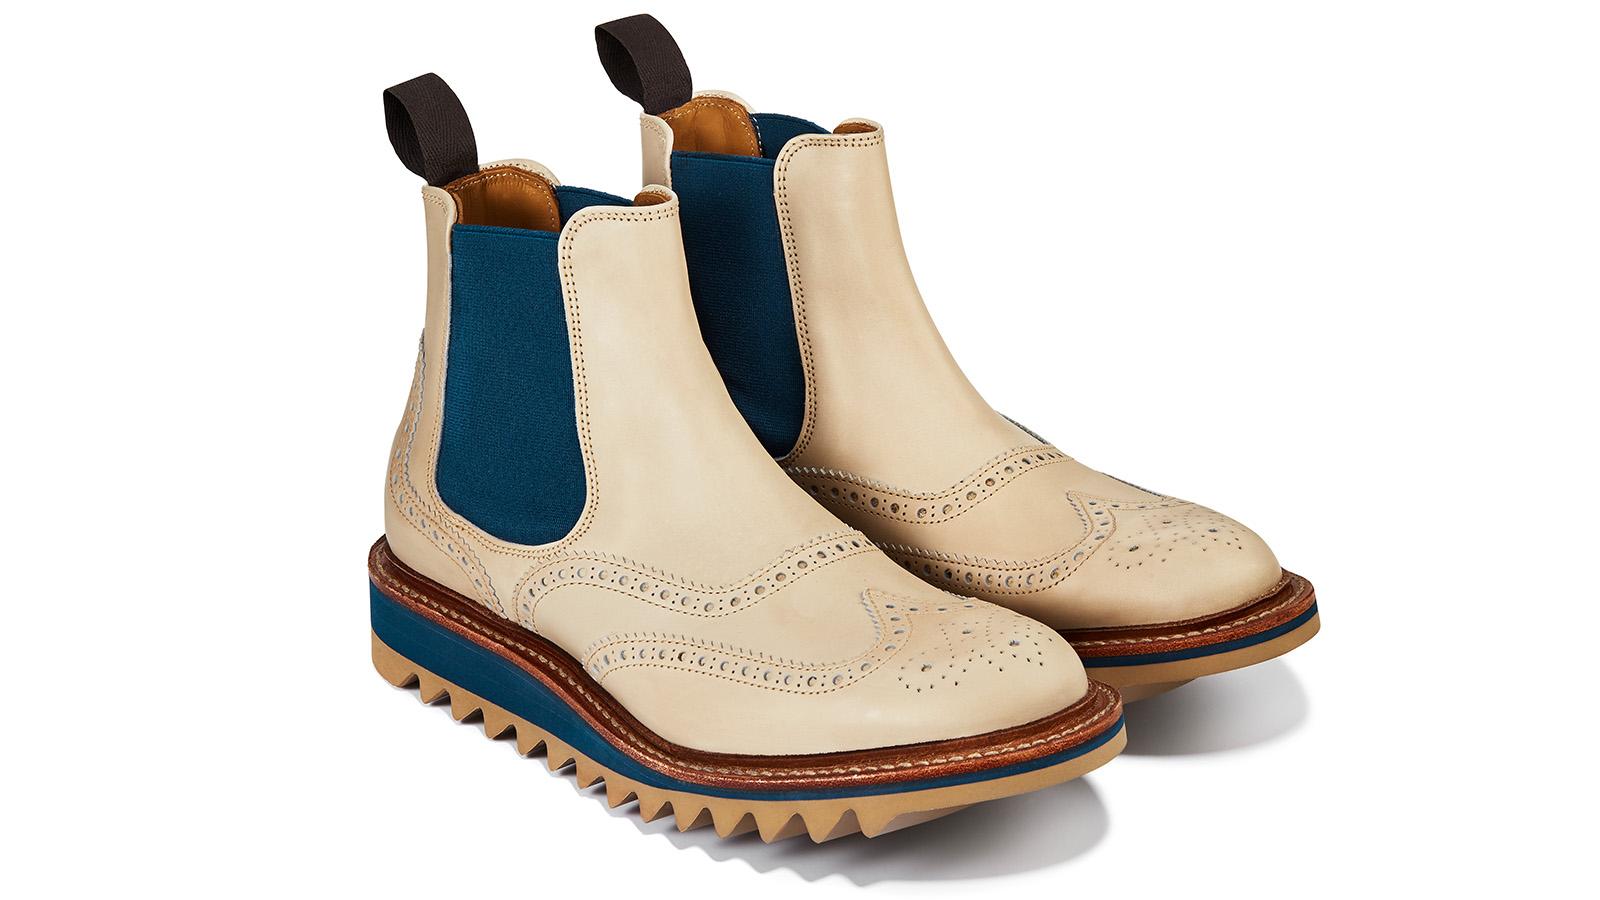 Pinnacle Chelsea boots